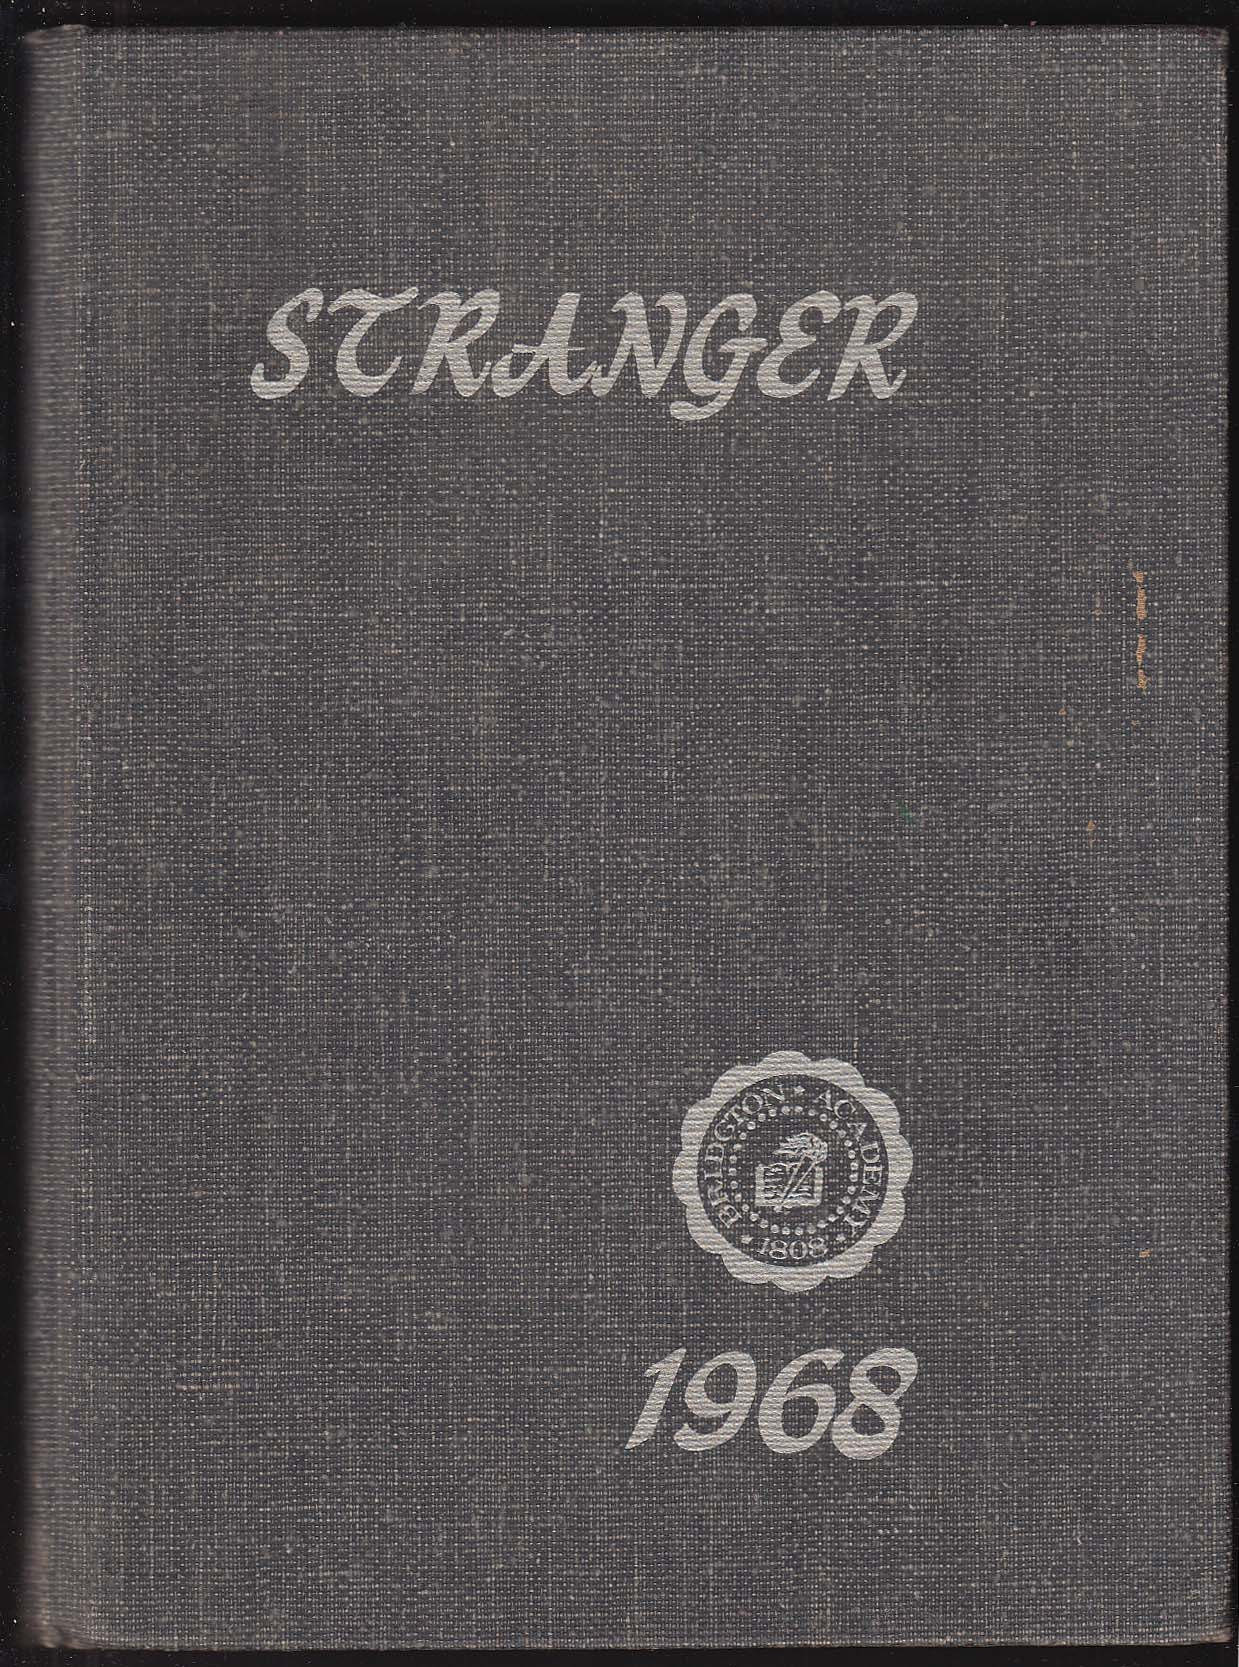 Stranger 1968 Yearbook Bridgton Academy North Bridgton Maine